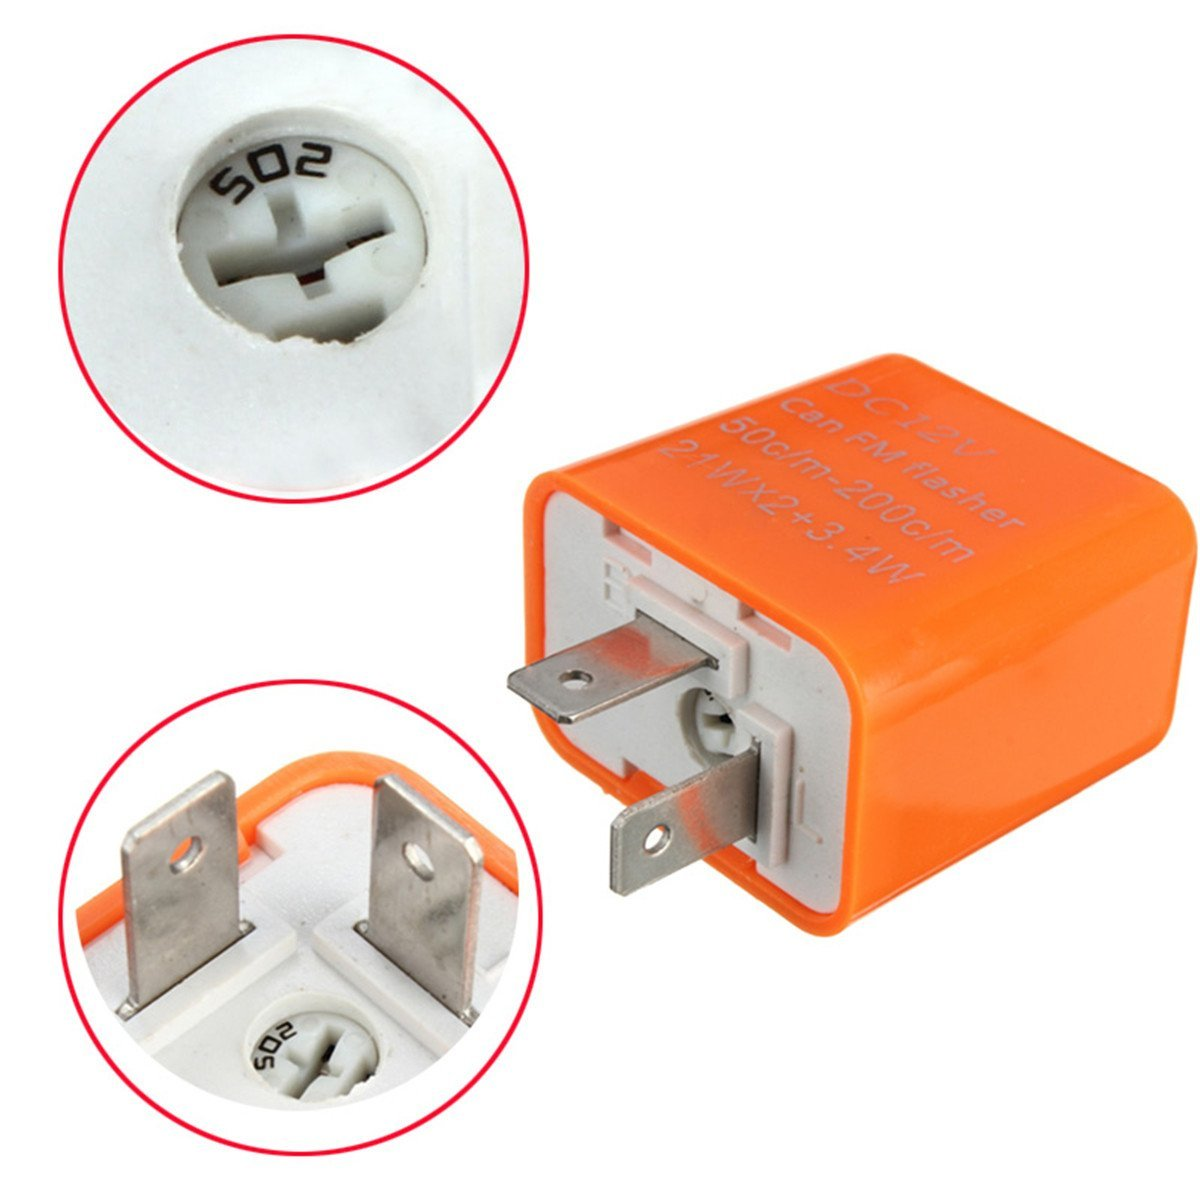 2 Pin 12v Motorcycle Led Turn Signal Flasher Relay Speed Two Based Alarm Circuits Adjustable Indicator Automotive